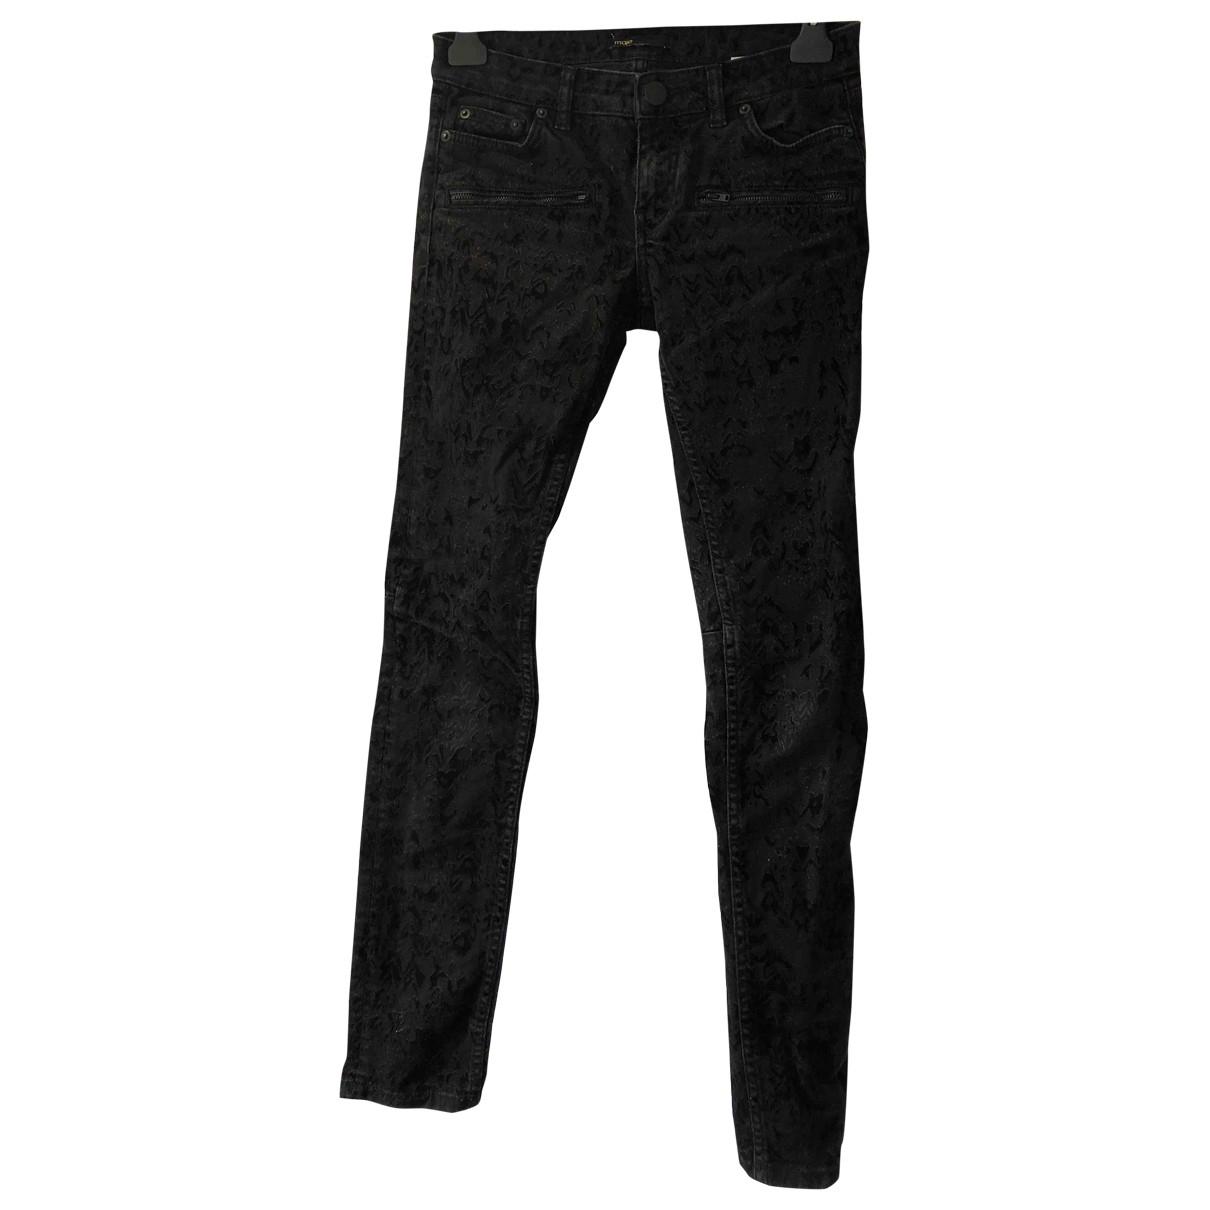 Maje \N Black Cotton Jeans for Women 36 FR